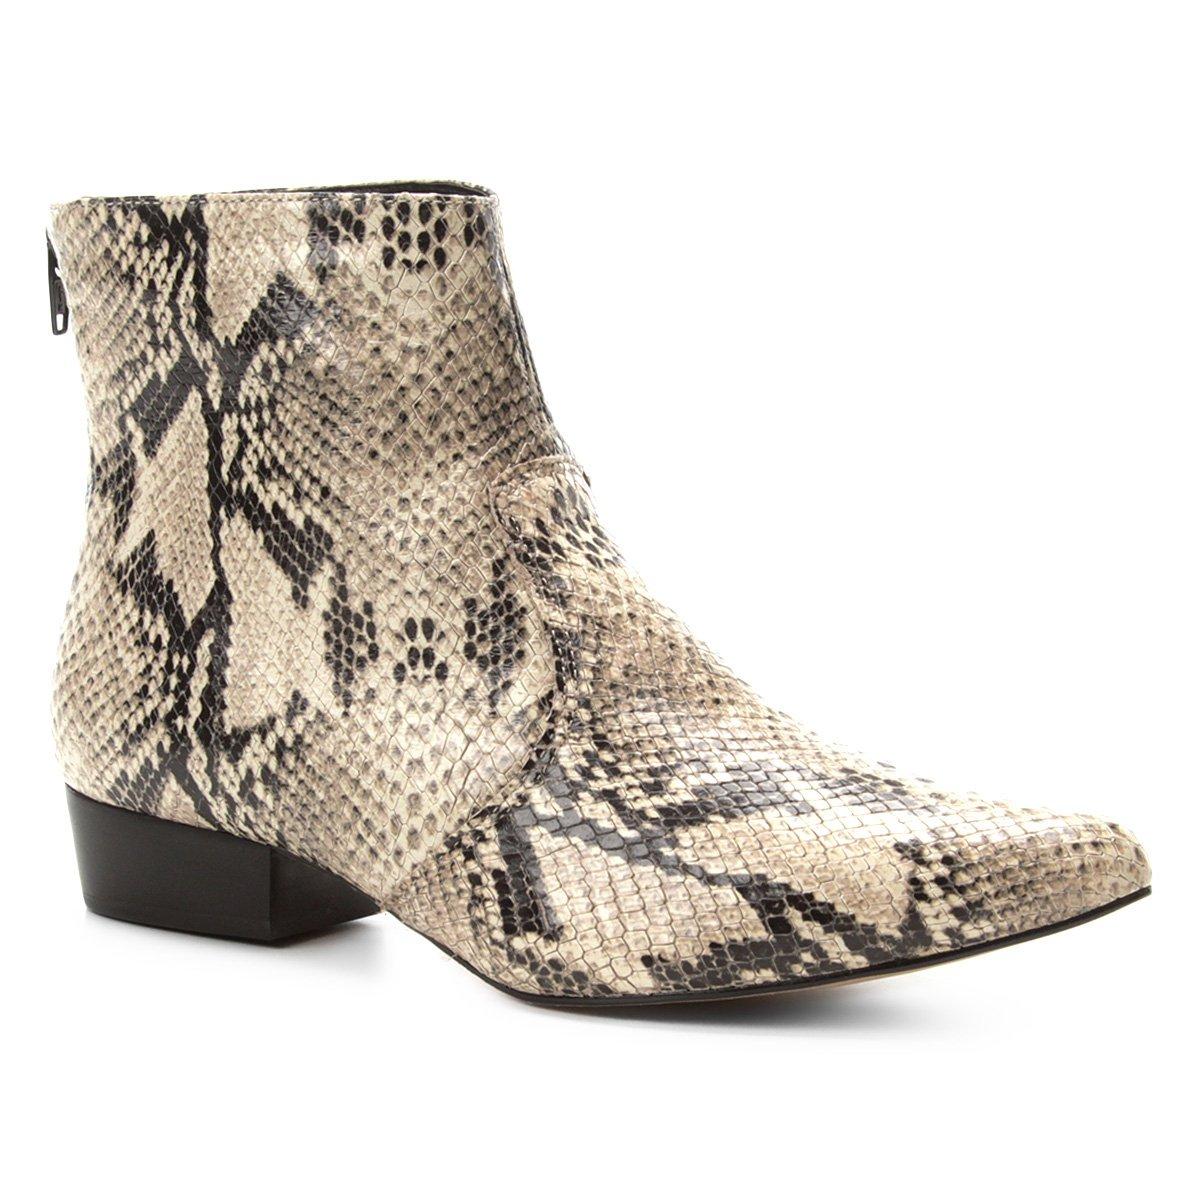 37841d49ae Bota Couro Cano Curto Shoestock Snake Feminina | Shoestock